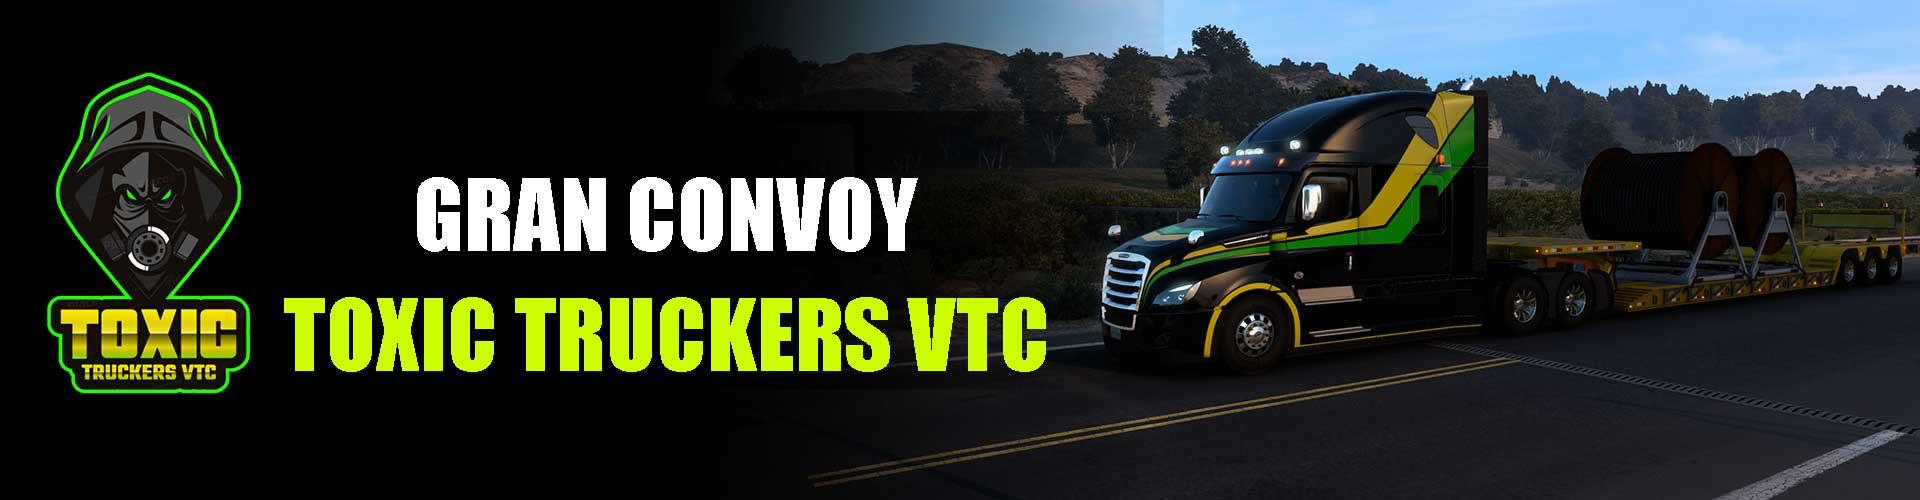 CONVOY OFICIAL  TOXIC TRUCKERS VTC